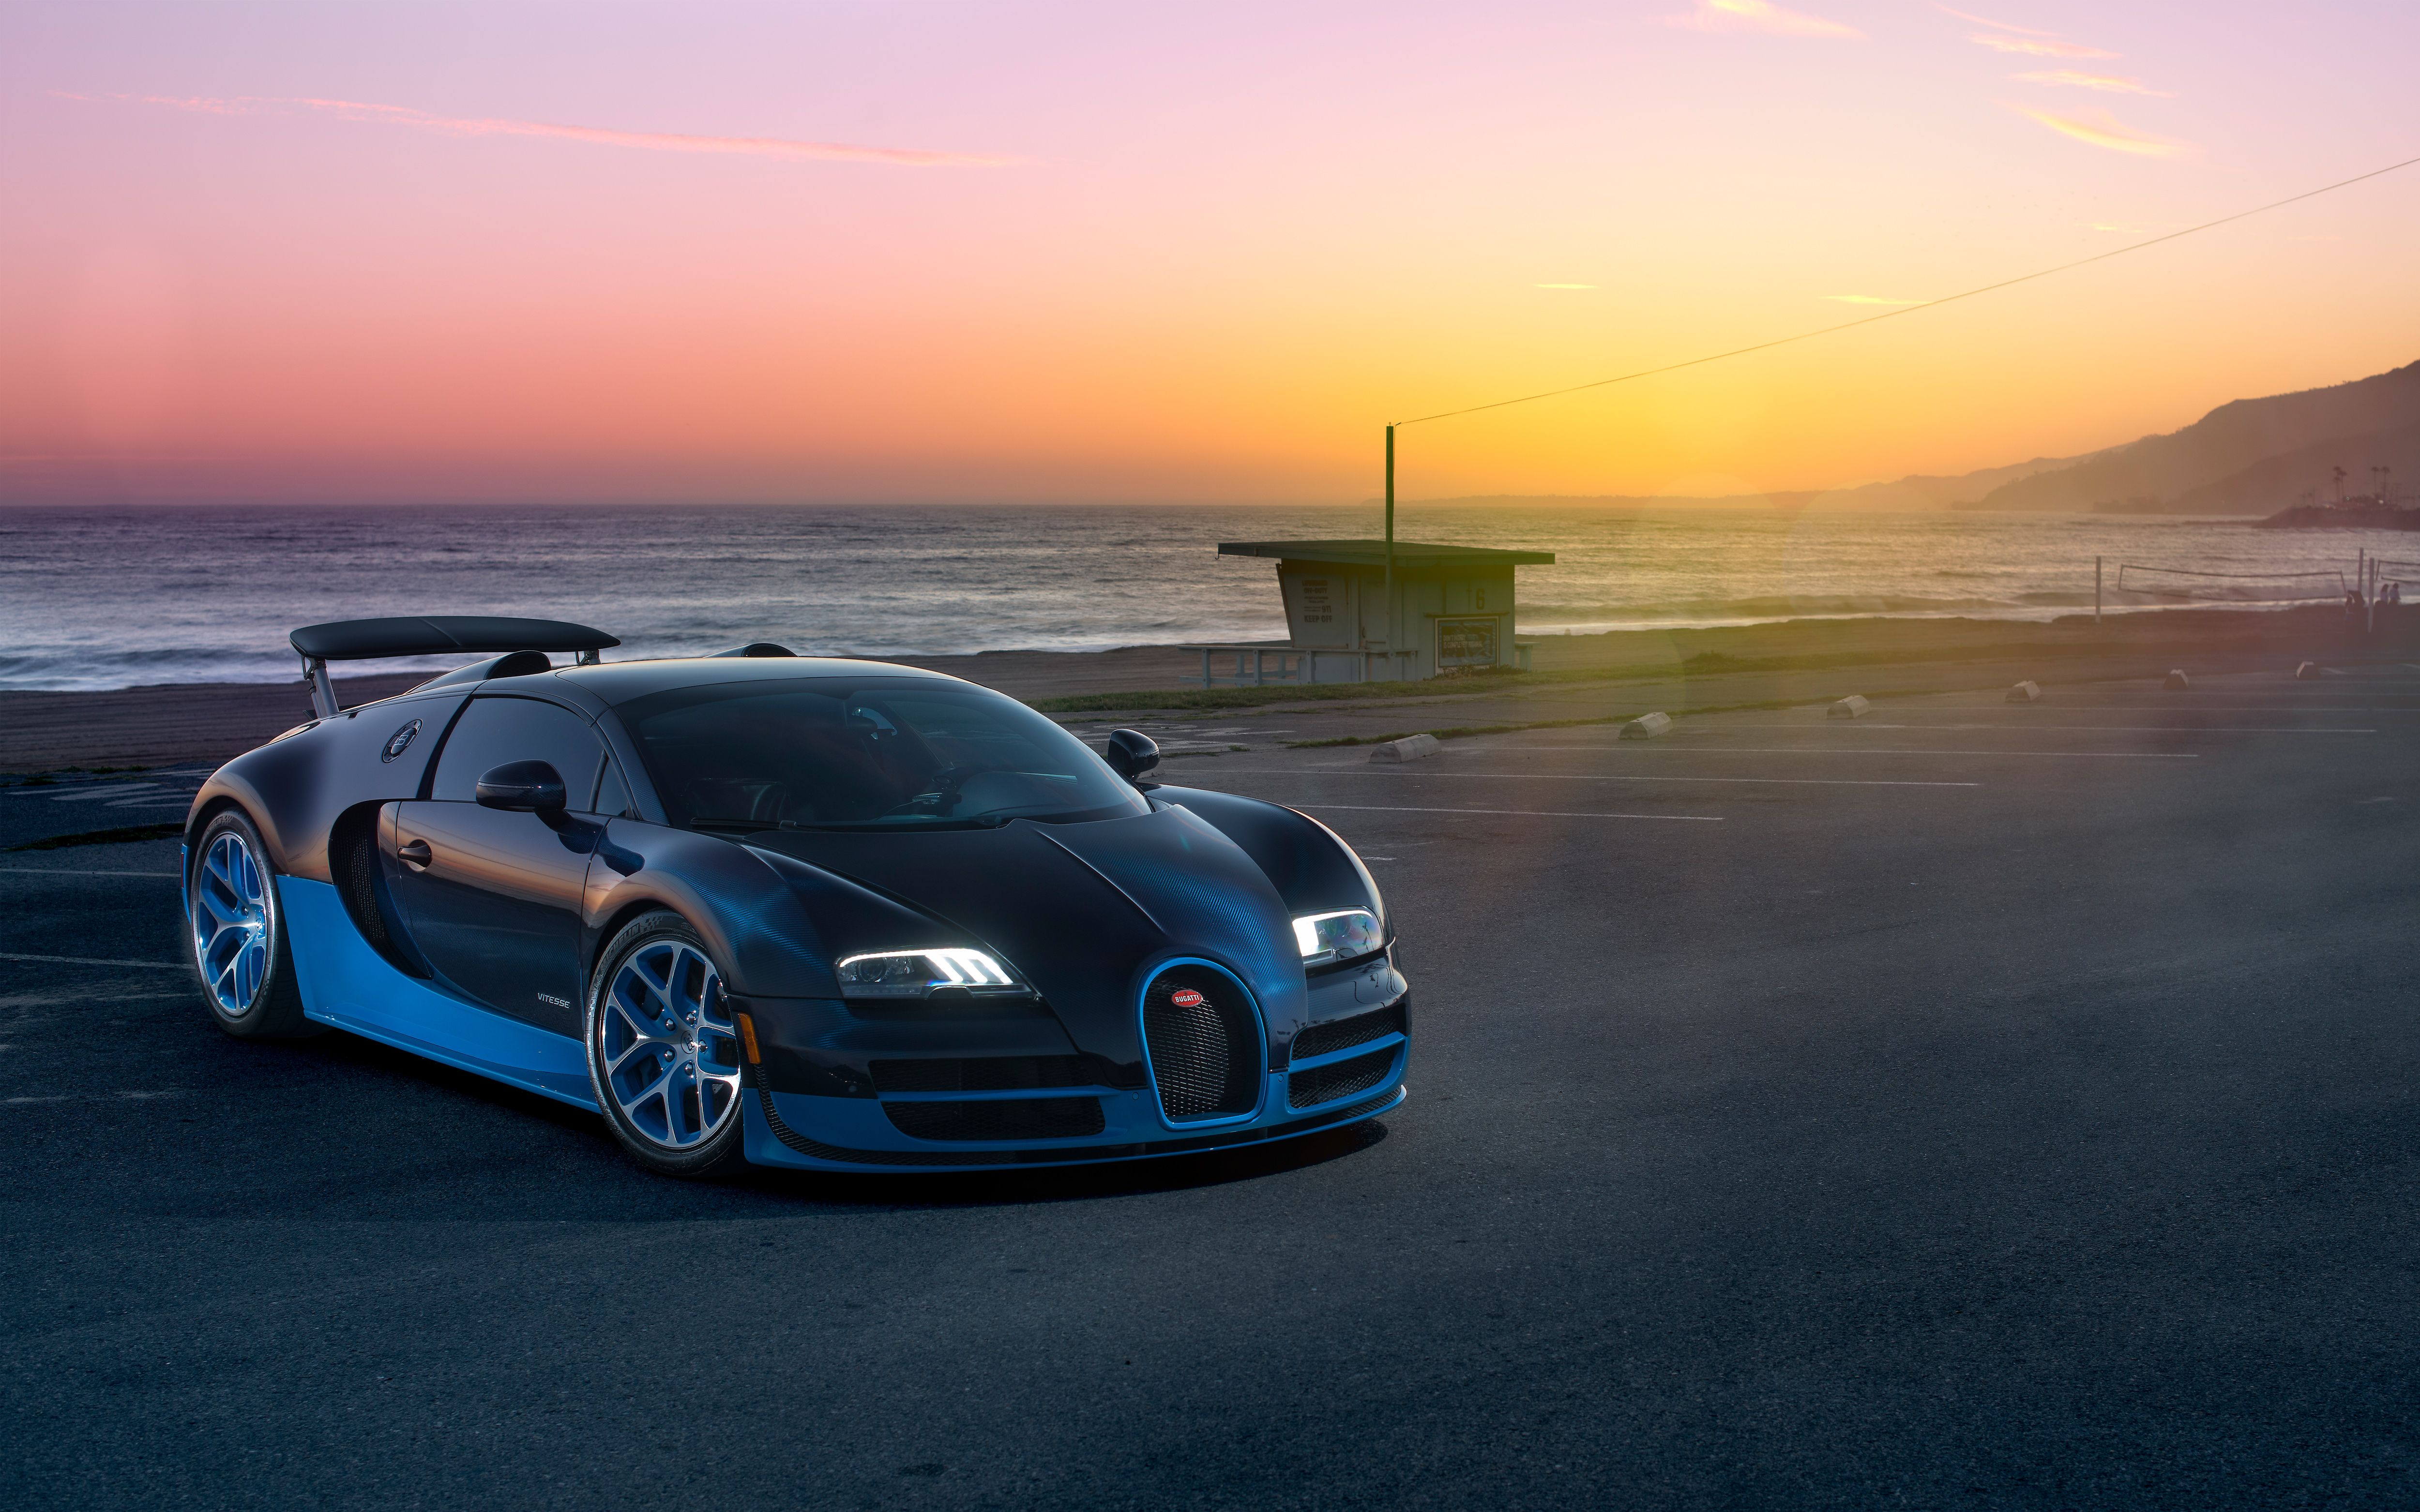 3e04946e3e0d3782dbecc21c9f3f4f01 Astounding Xe Bugatti Veyron Grand Sport Vitesse Cars Trend